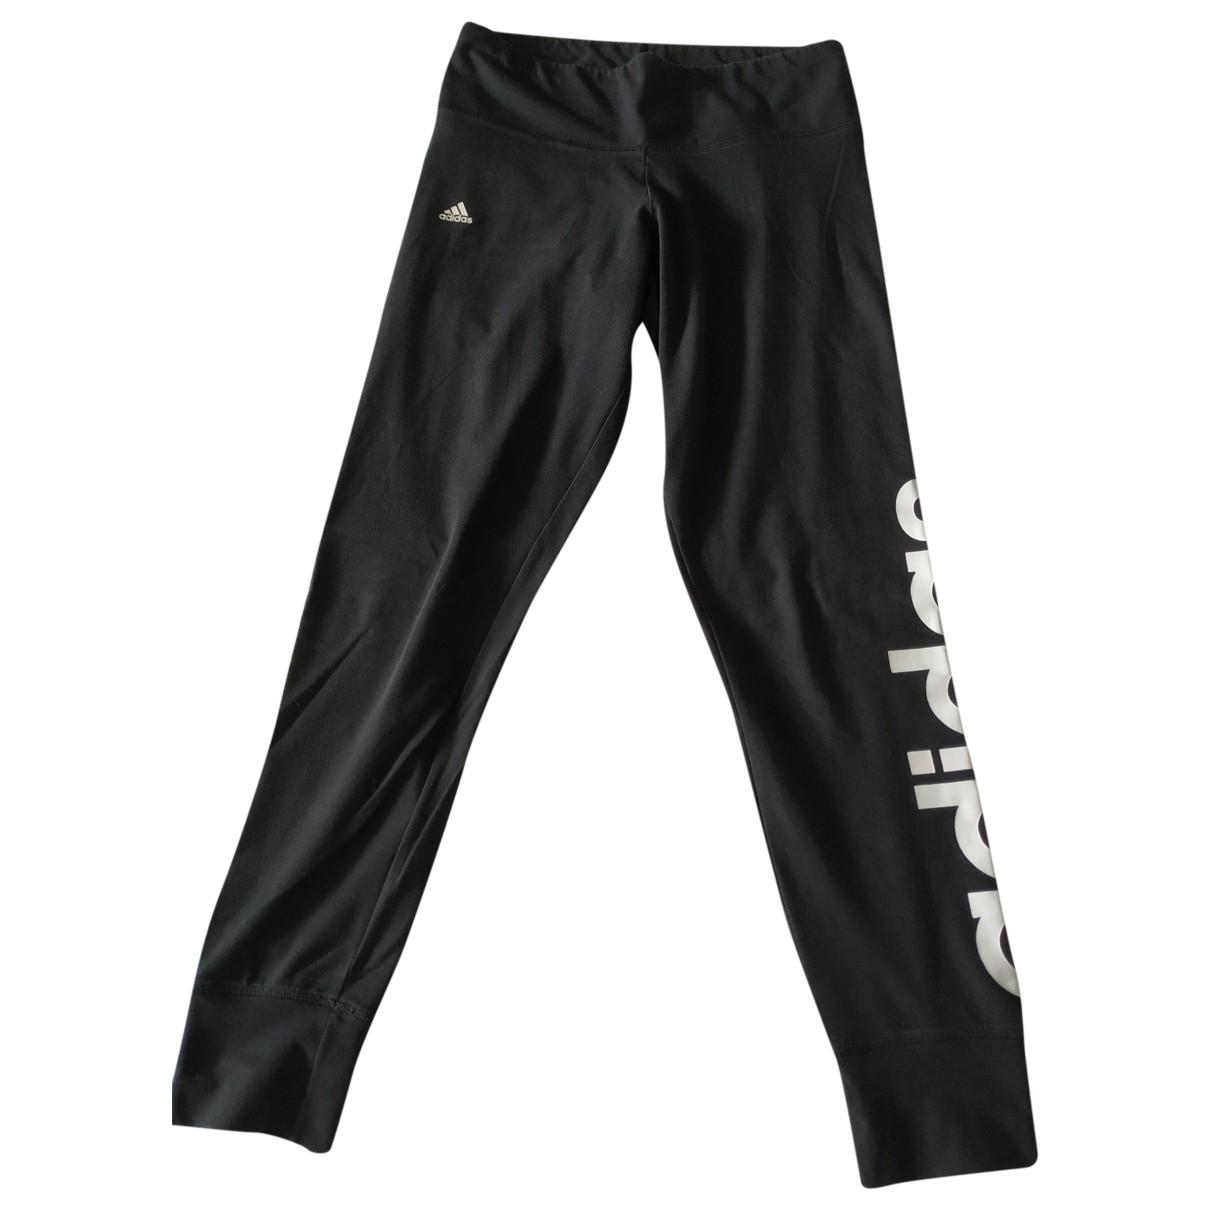 Adidas \N Hose in  Schwarz Baumwolle